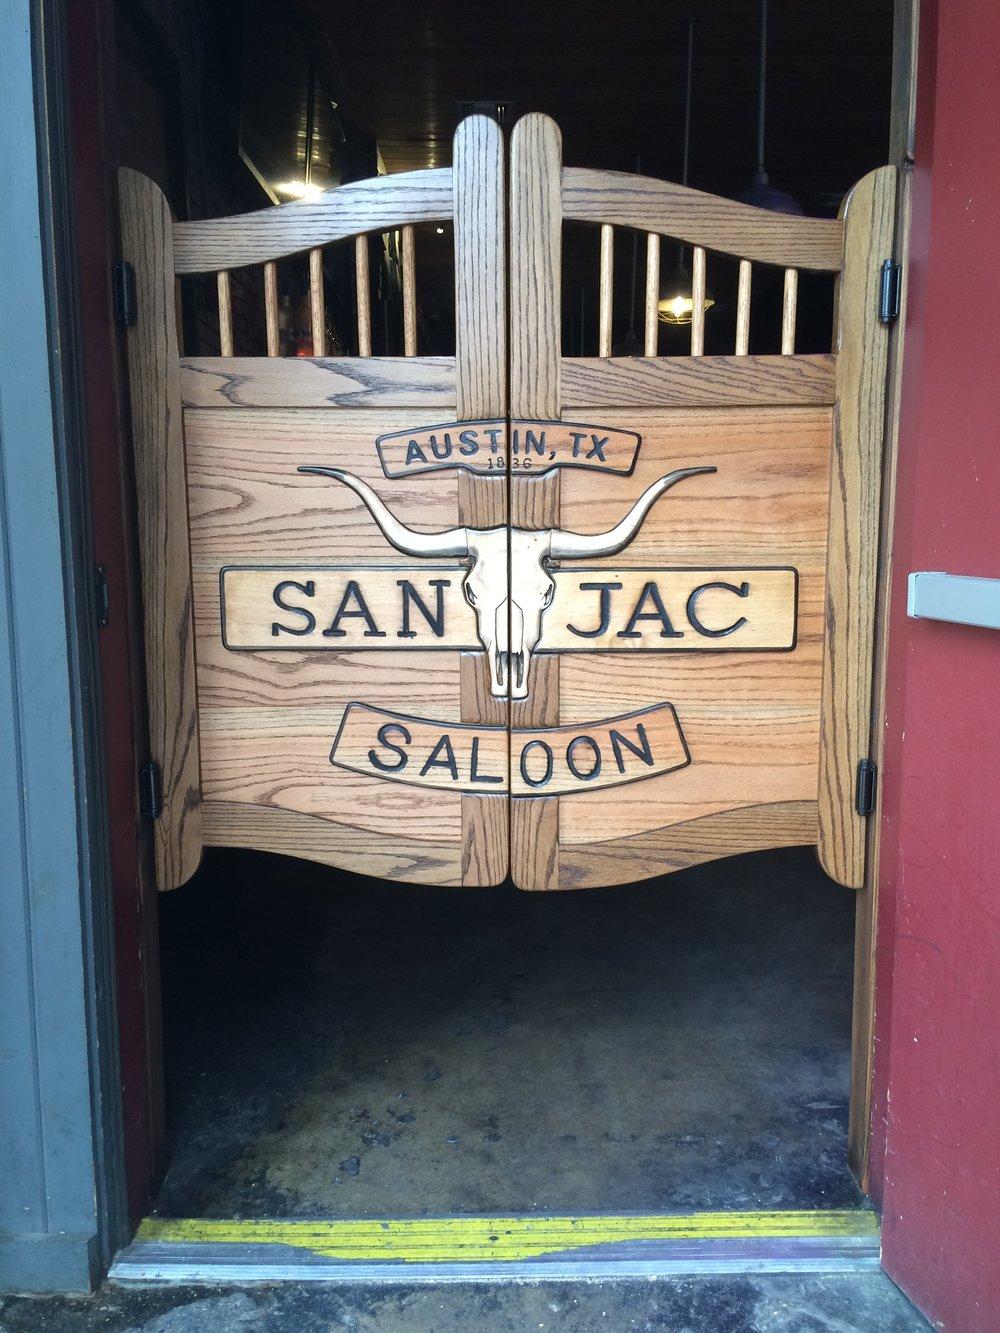 Merveilleux Western Swinging Saloon Door With Longhorn Skull   San Jac Saloon, Austin,  TX